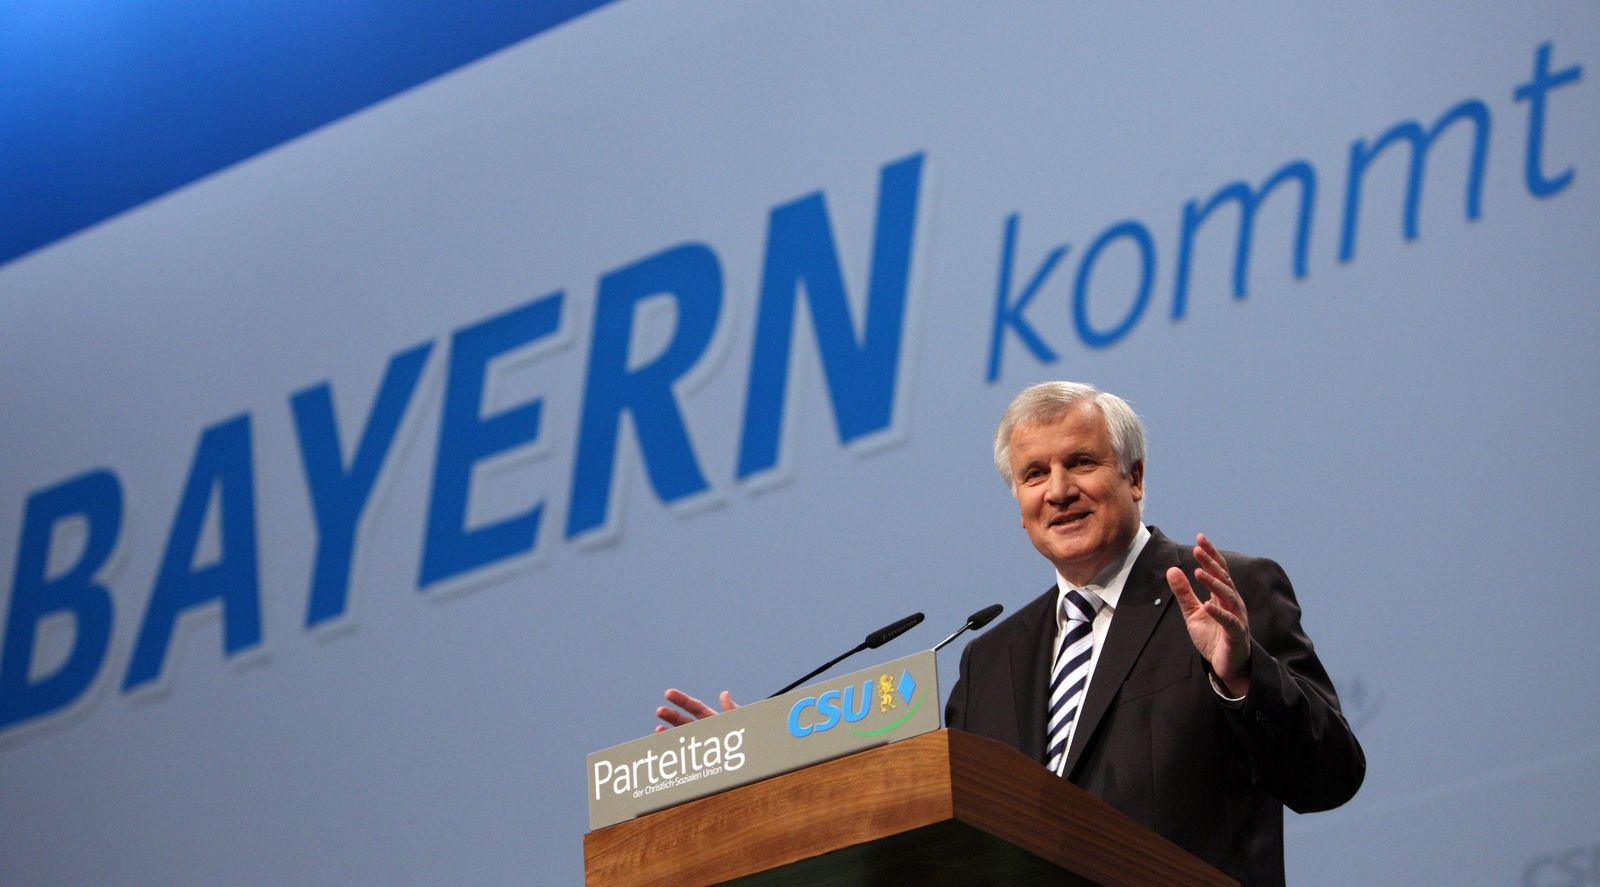 CSU-Parteitag/ Horst Seehofer